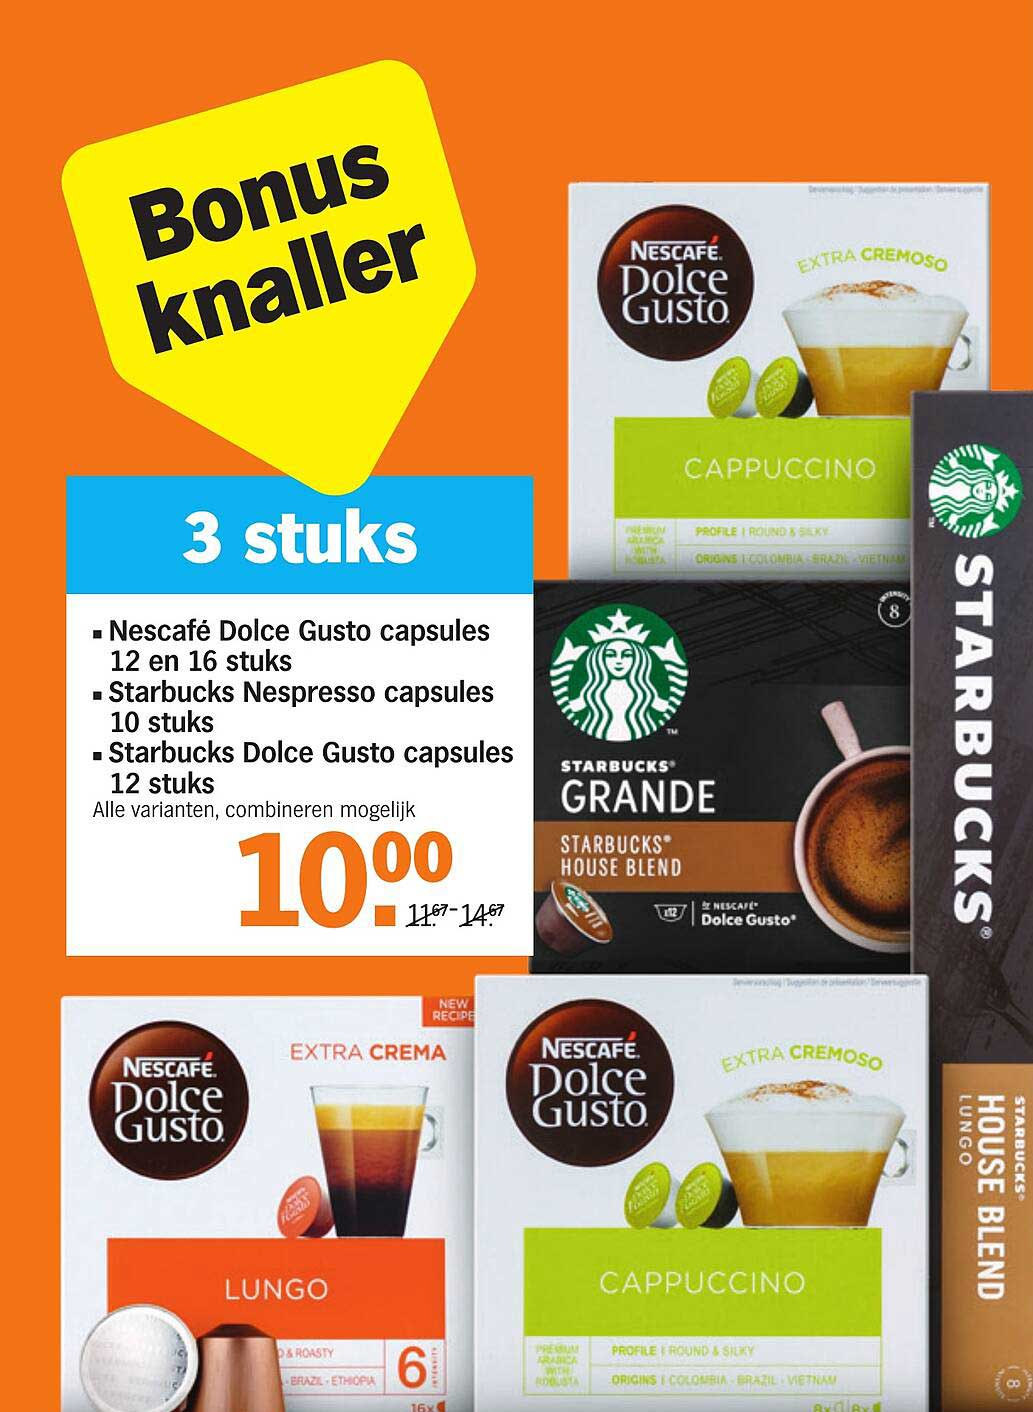 Albert Heijn Nescafé Dolce Gusto Capsules 12 En 16 Stuks, Starbucks Nespresso Capsules 10 Stuks Of Starbucks Dolce Gusto Capsules 12 Stuks